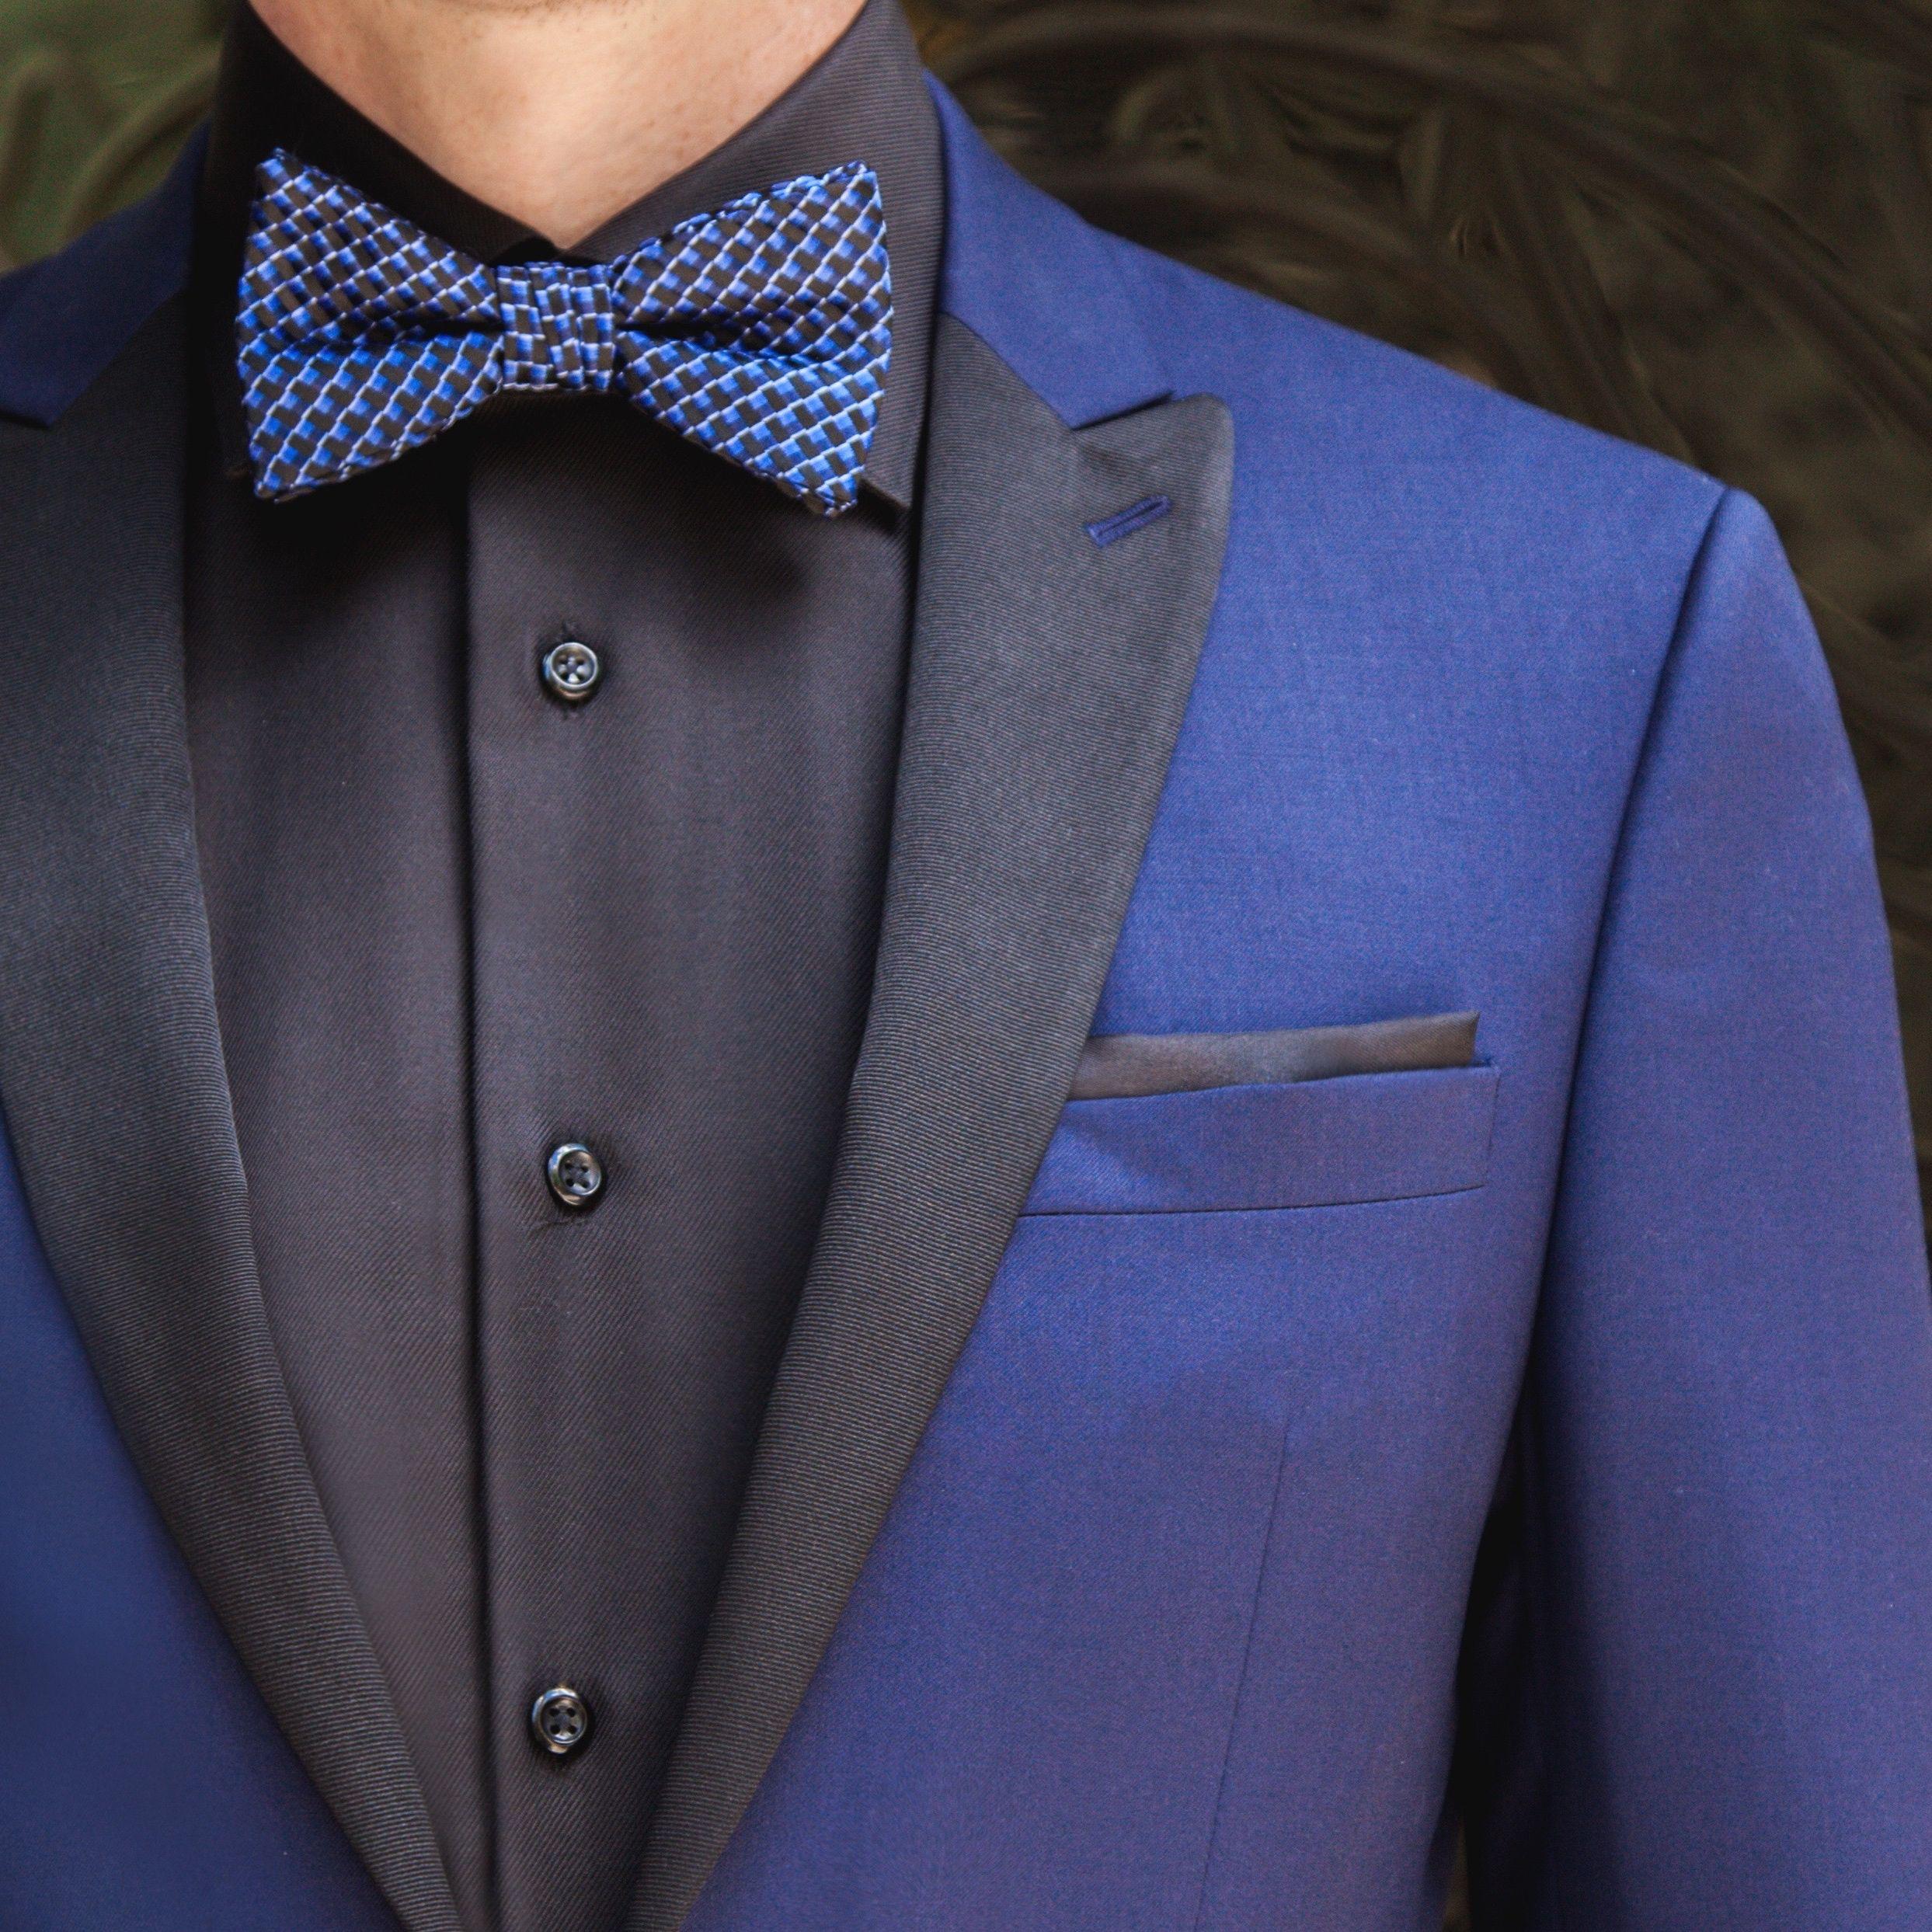 Home | Pinterest | Moda de caballero, Trajes azules y Caballeros